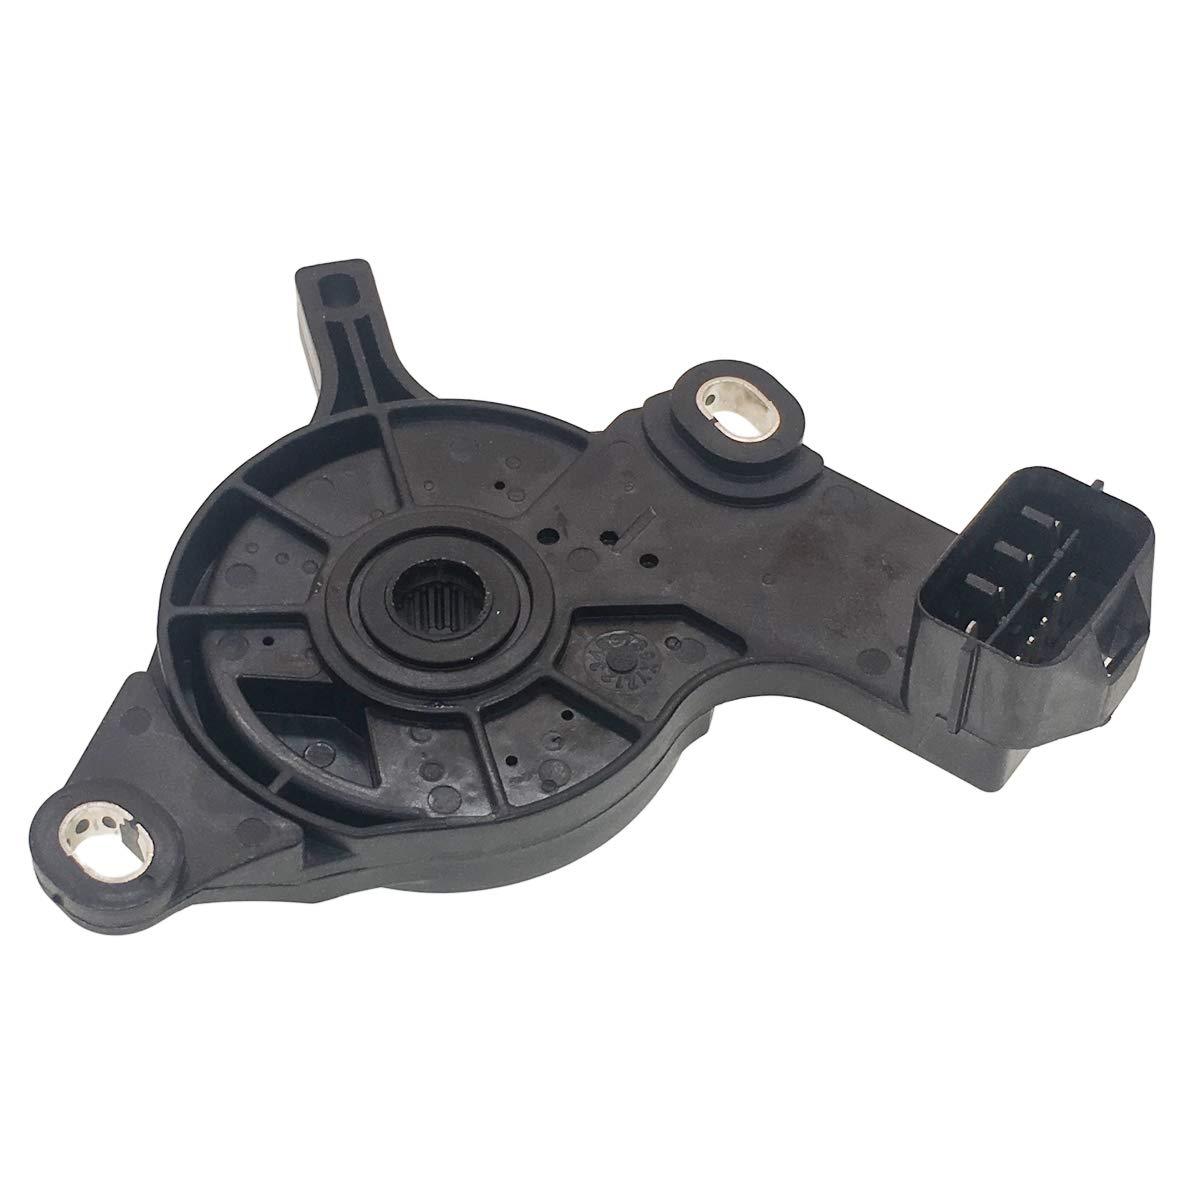 Transmission Al sold out. Range Sensor Neutral 37720-86Z01 Luxury goods Switch Fits Safety